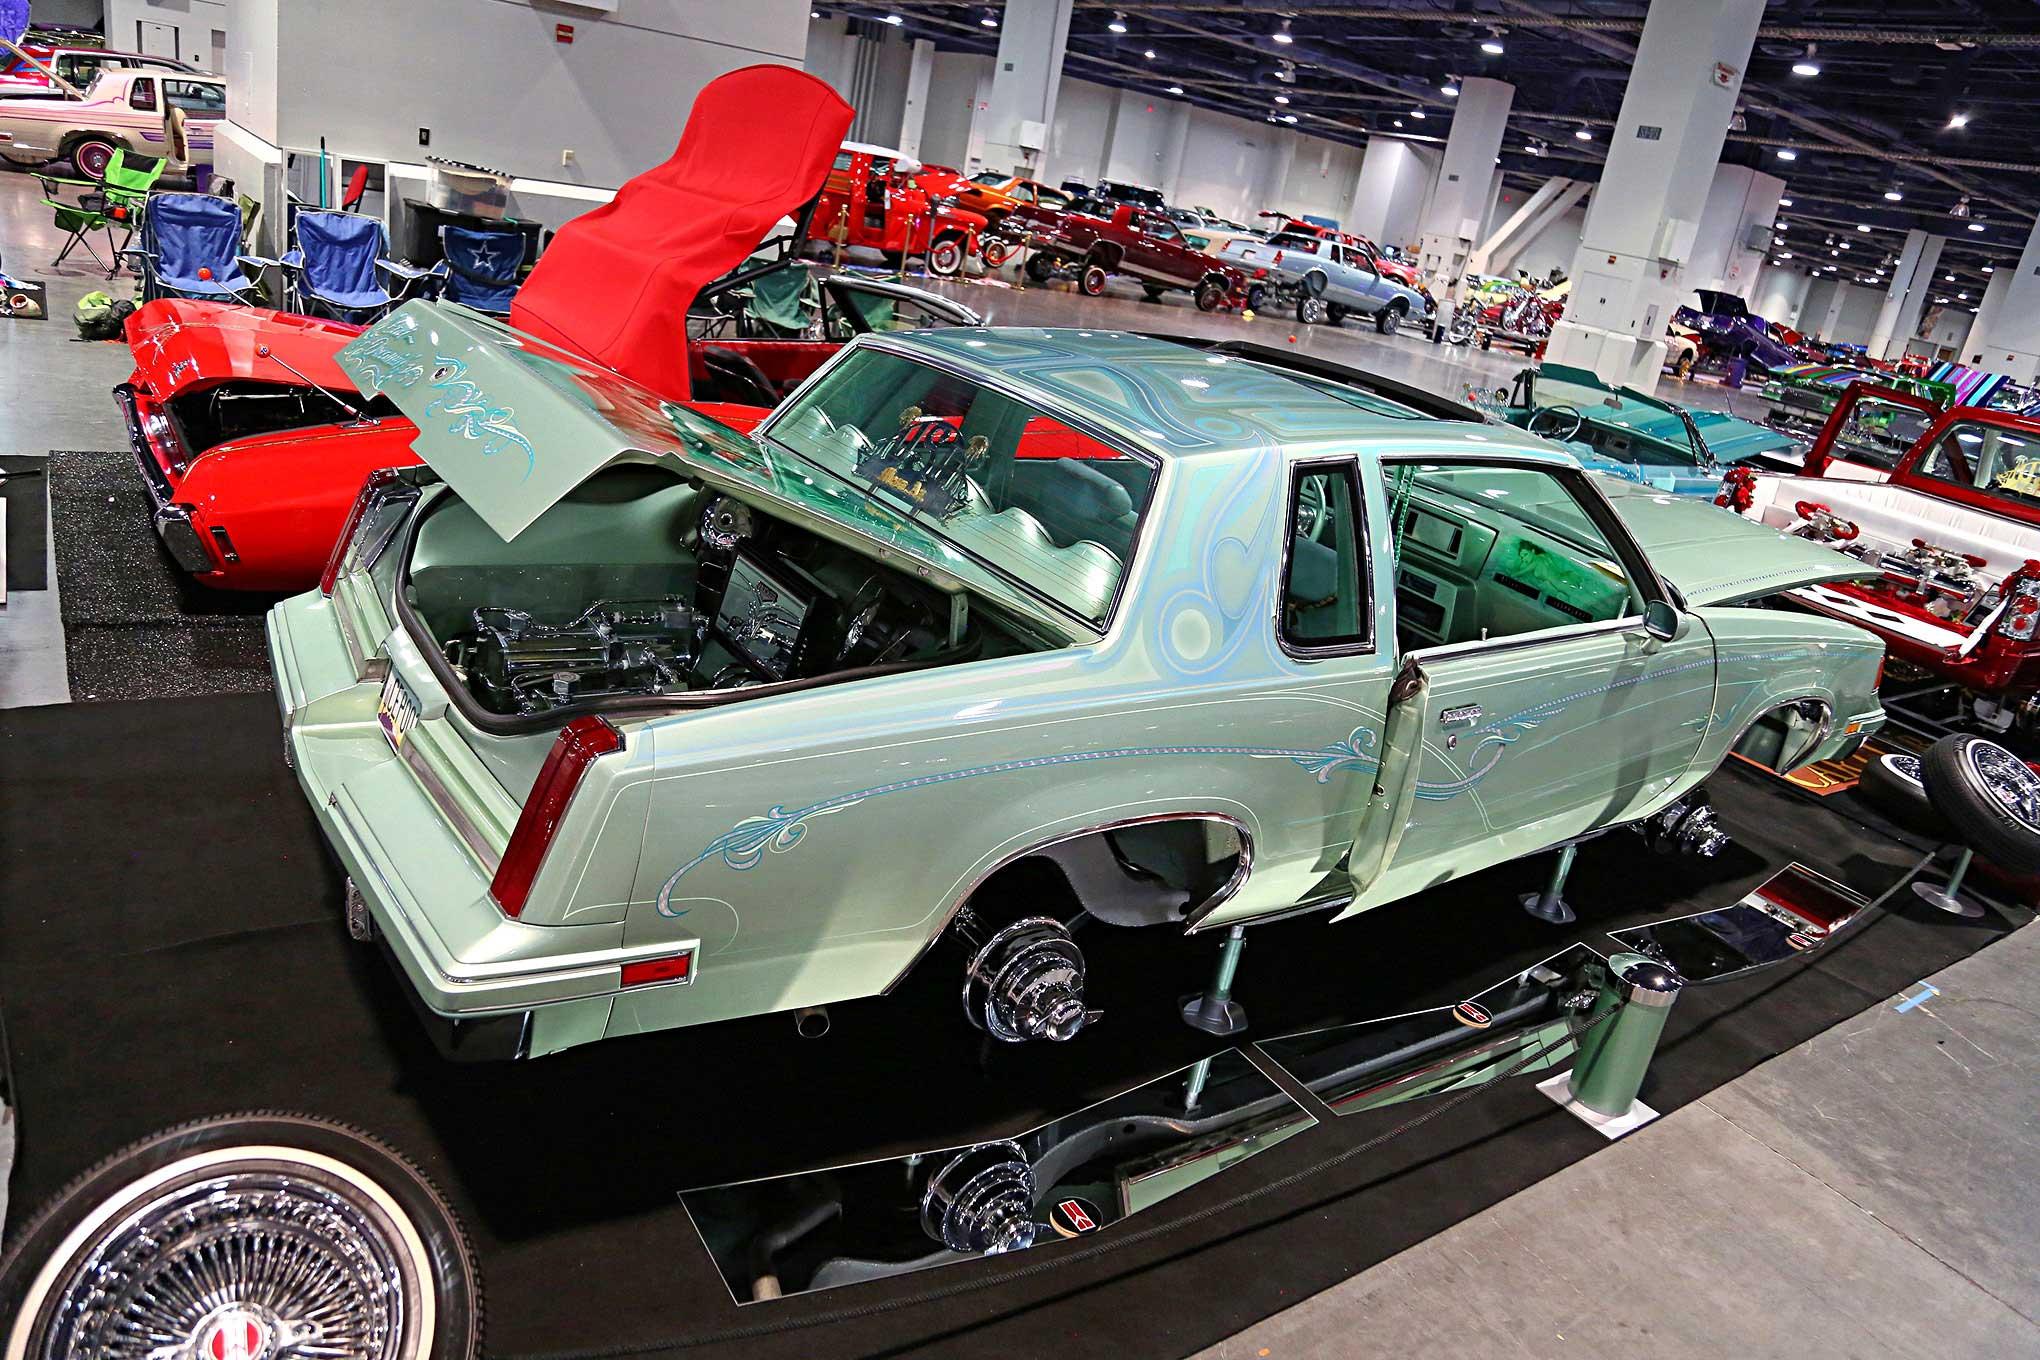 2018 Las Vegas Super Show Oldsmobile Cutlass Supreme - Lowrider